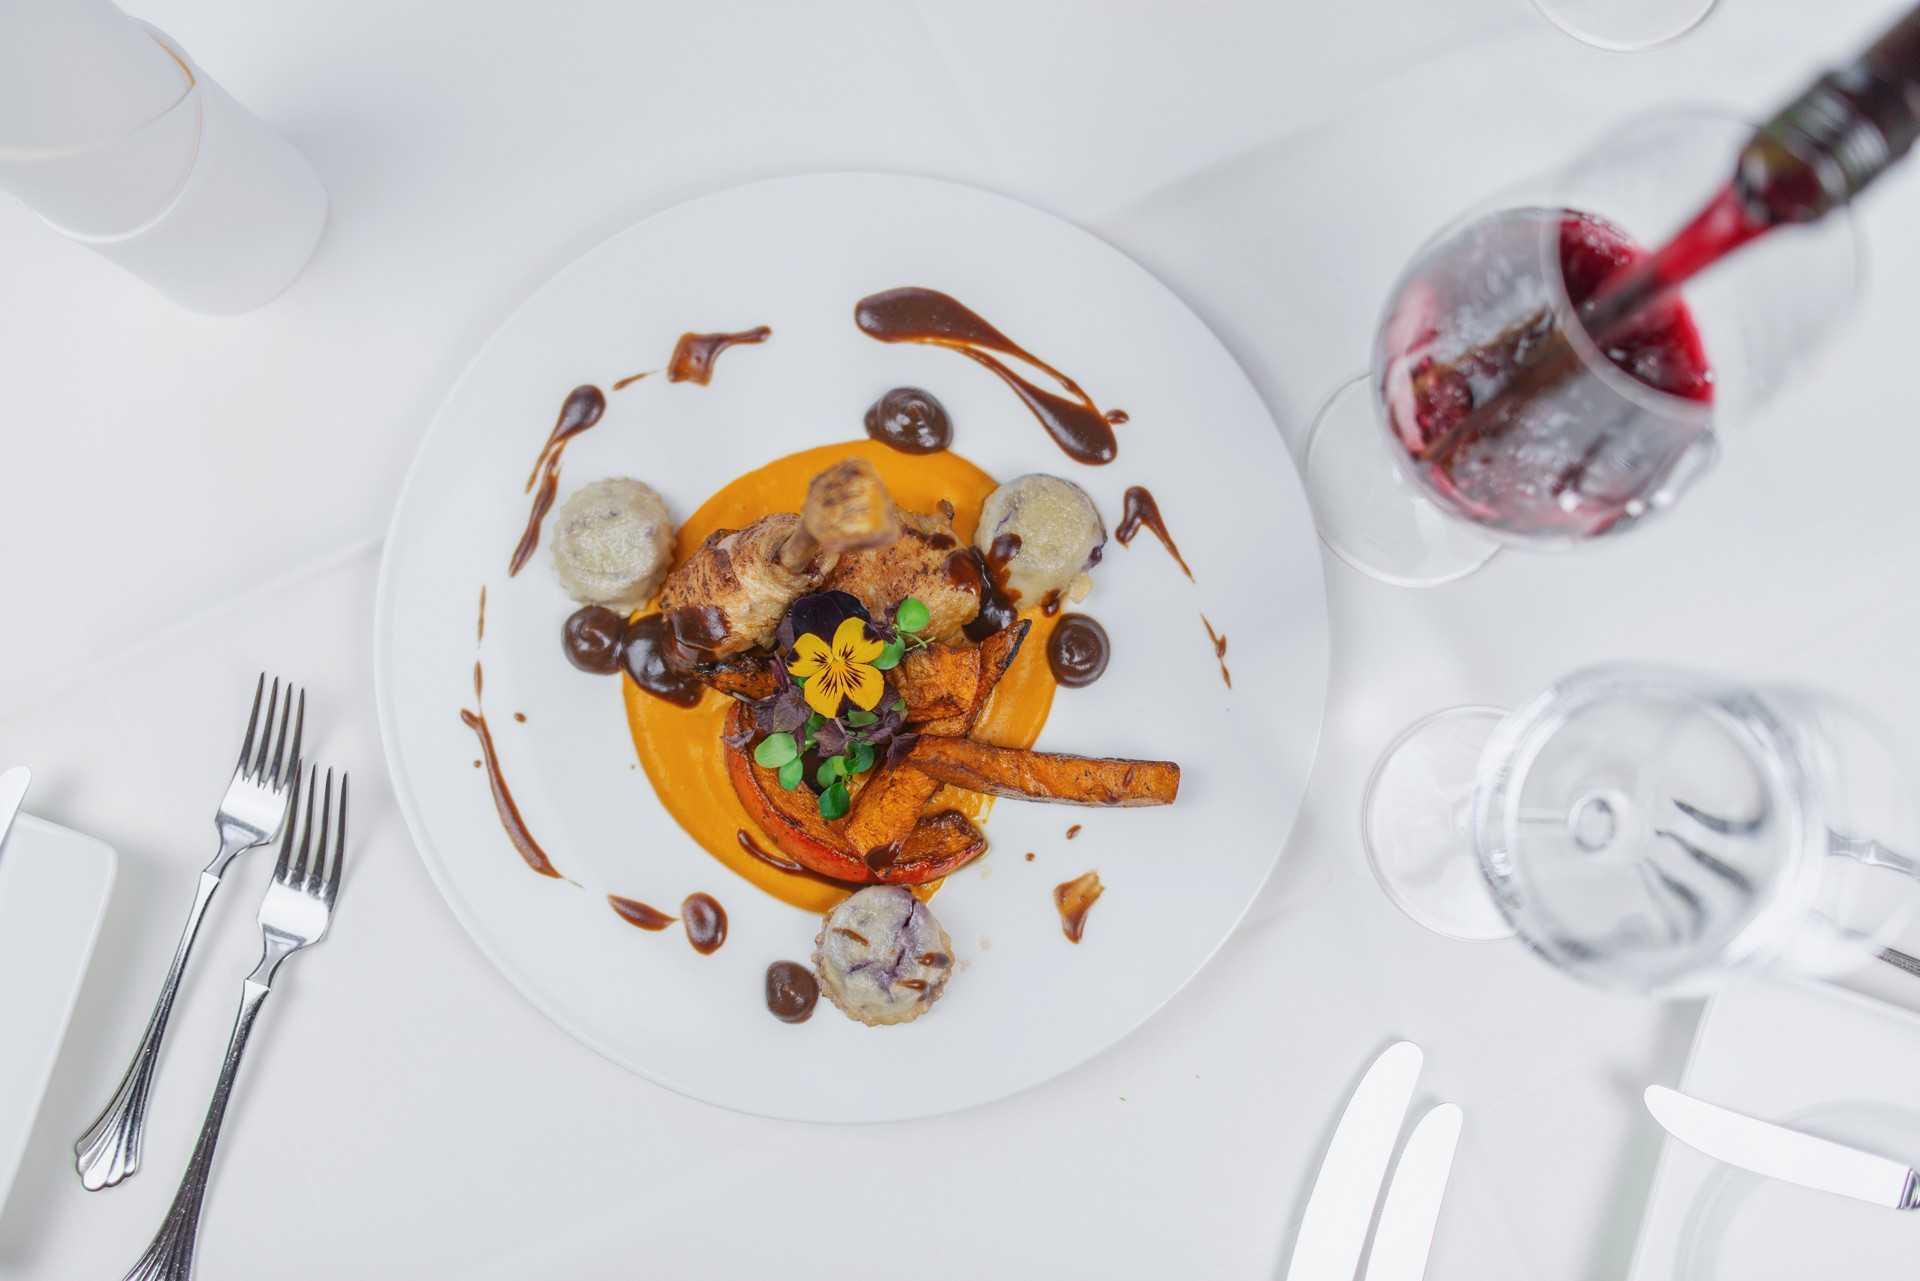 Dish at Bellevue Dresden